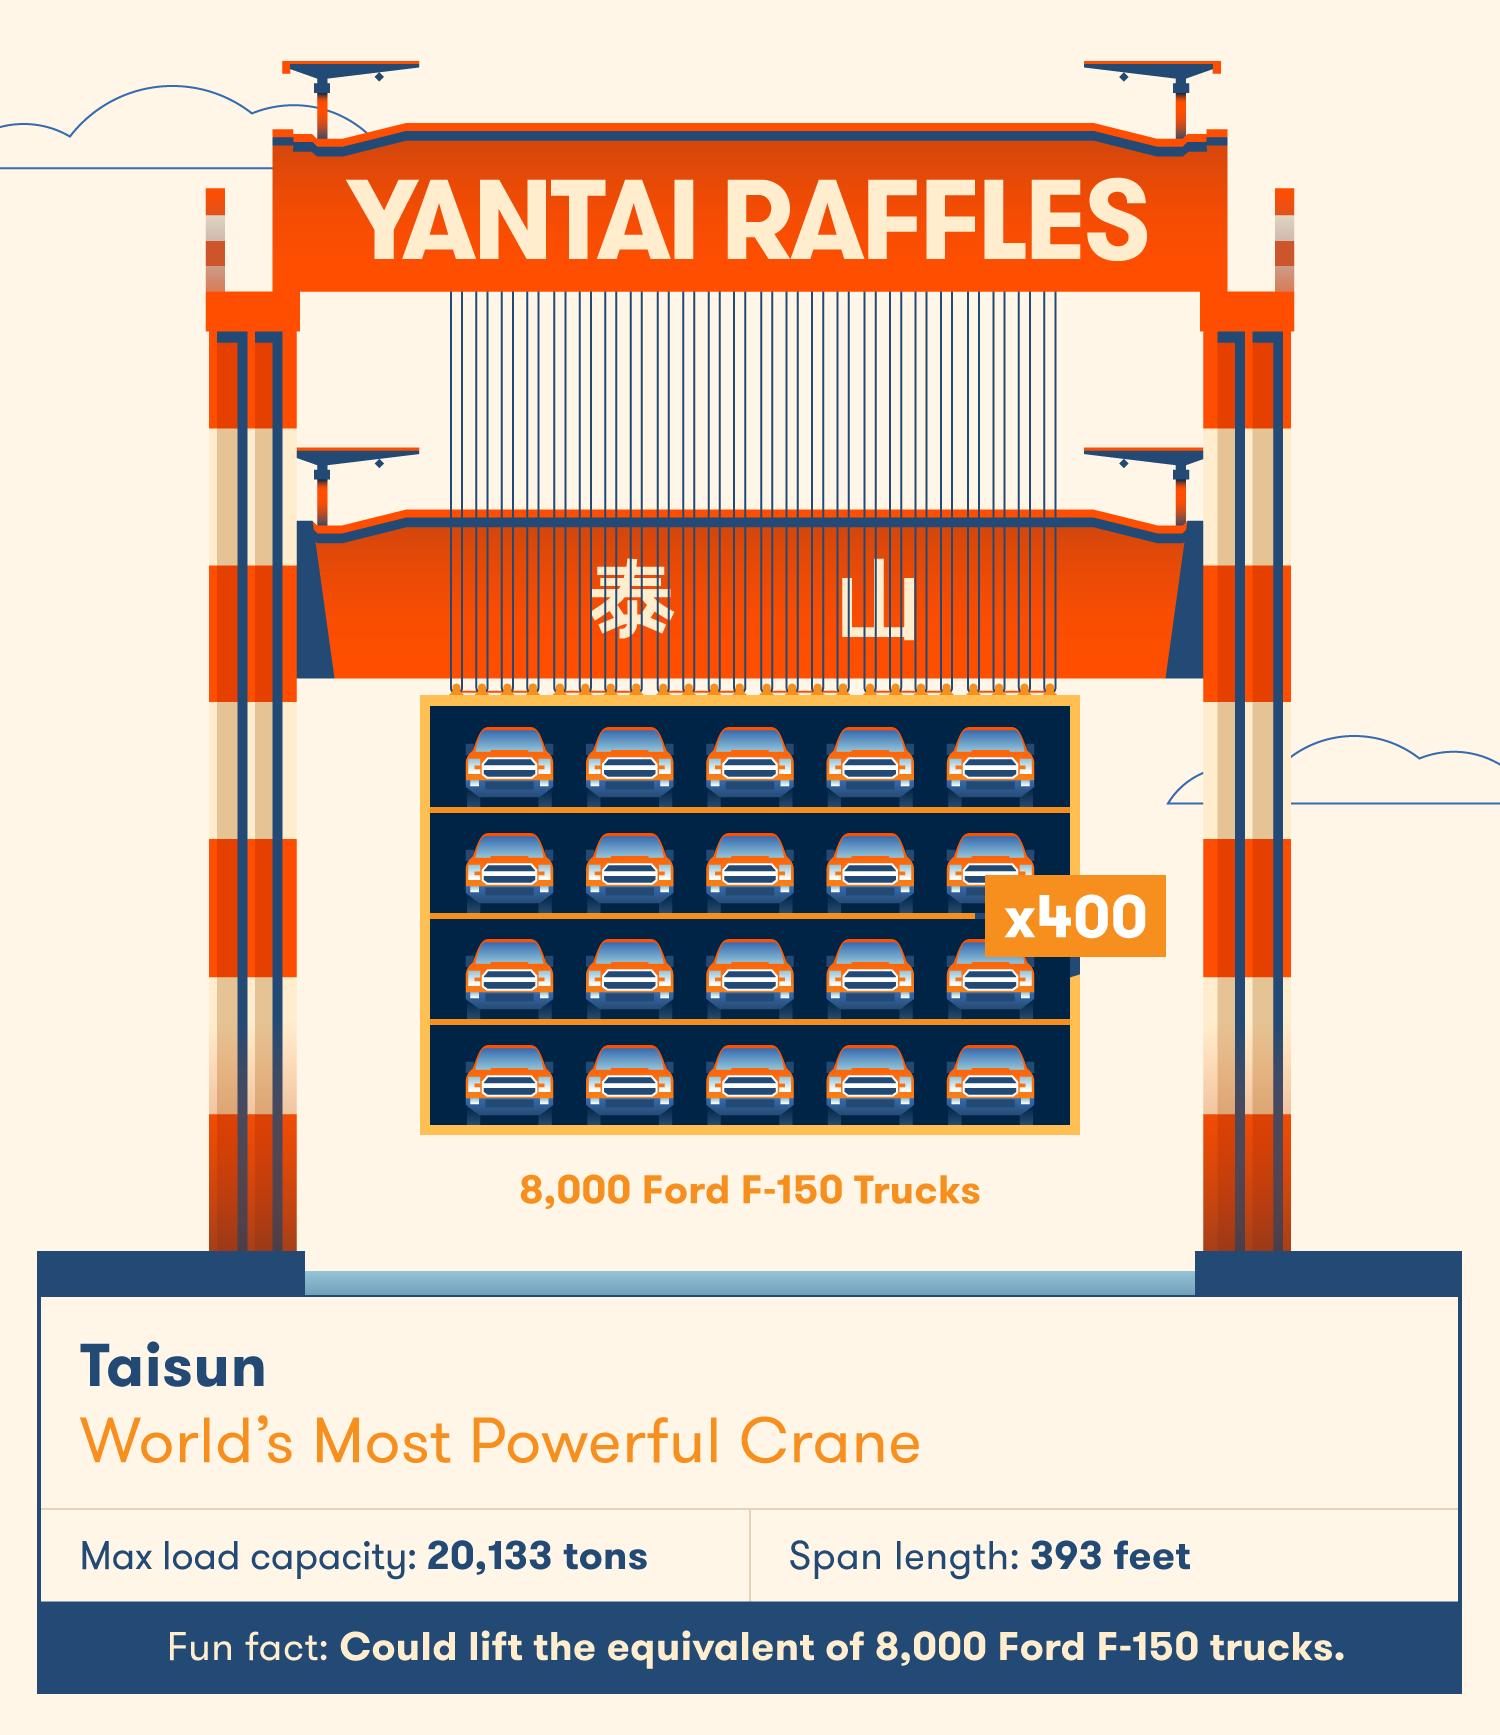 Taisun is the world's strongest crane.